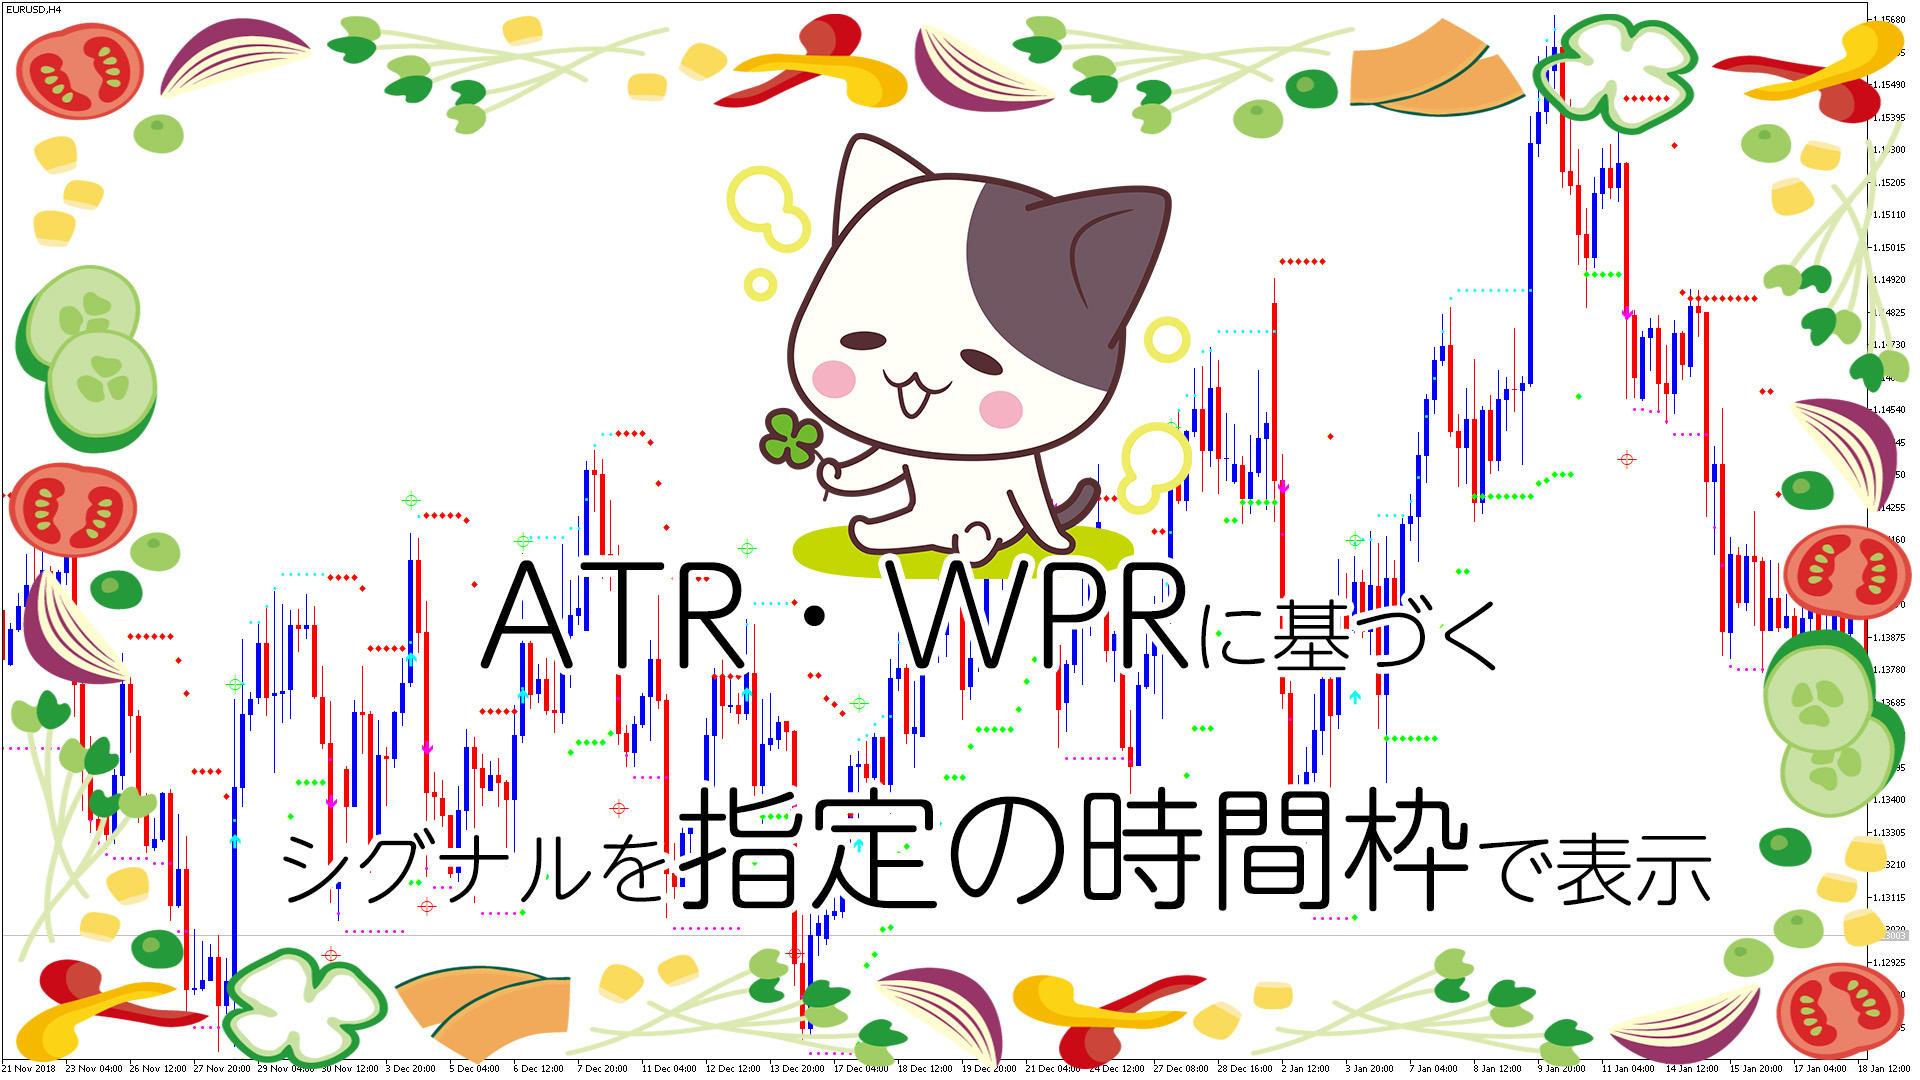 ATR・ウィリアム%Rに基づくシグナルを指定した時間枠で表示するMT5インジケータ-「HLCrossSigForWPR_HTF」